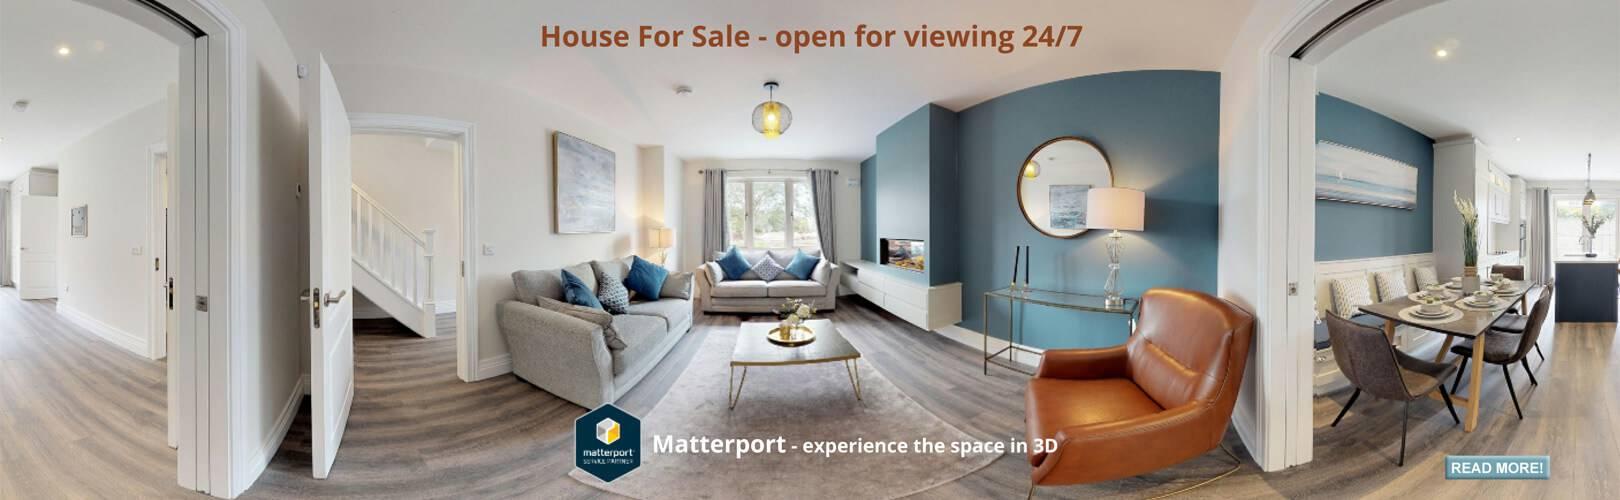 matterport-3d-360-degree-showhouse-real-estate-virtual-tours-v1-1620x500